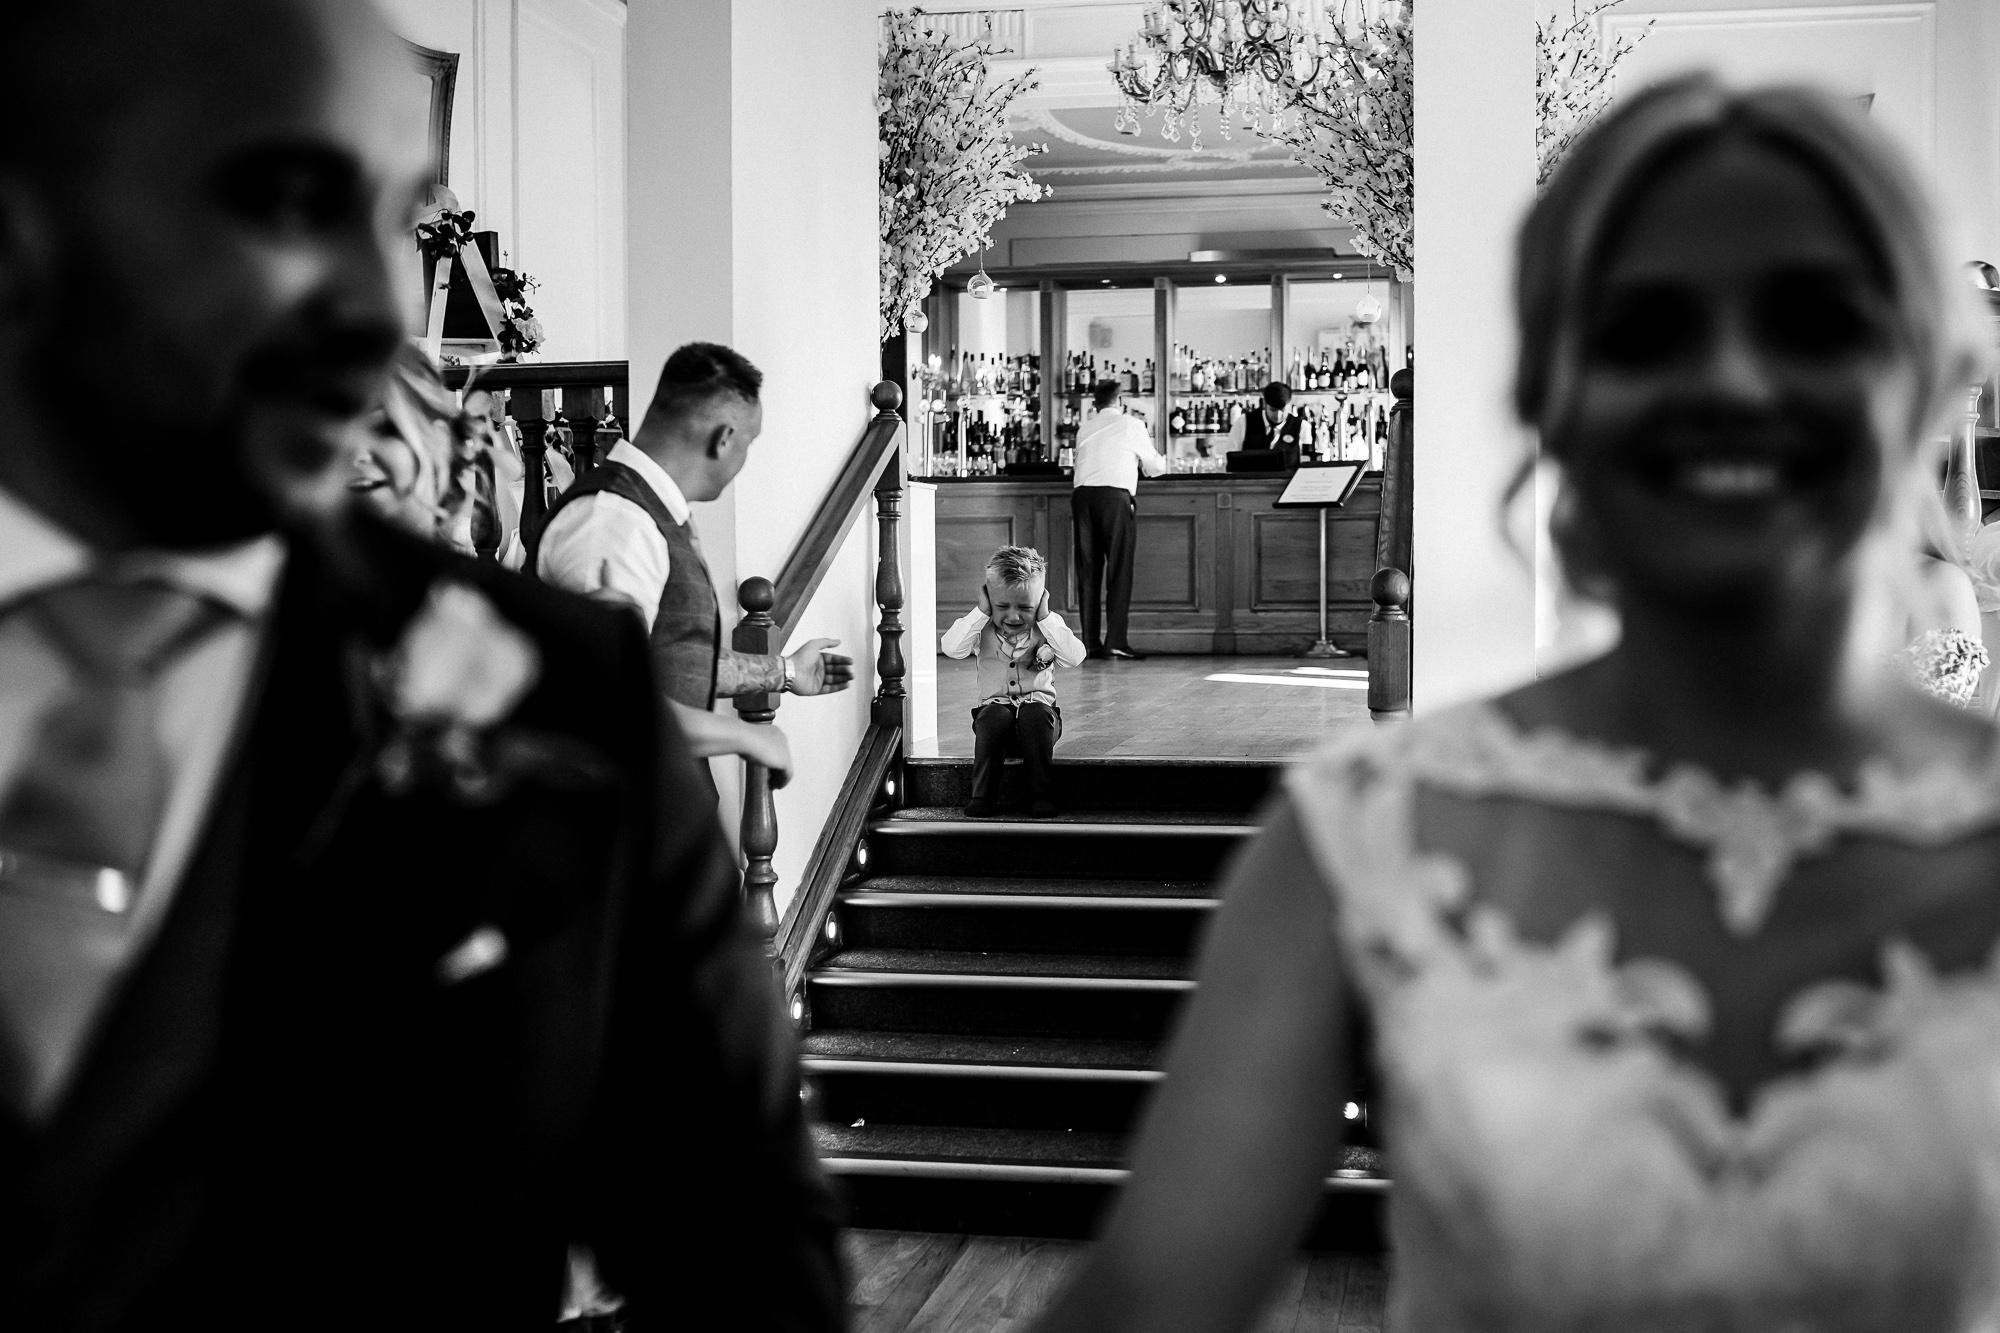 West Tower Wedding Photographer Ormskirk Lancashire wedding photography (40 of 57).jpg